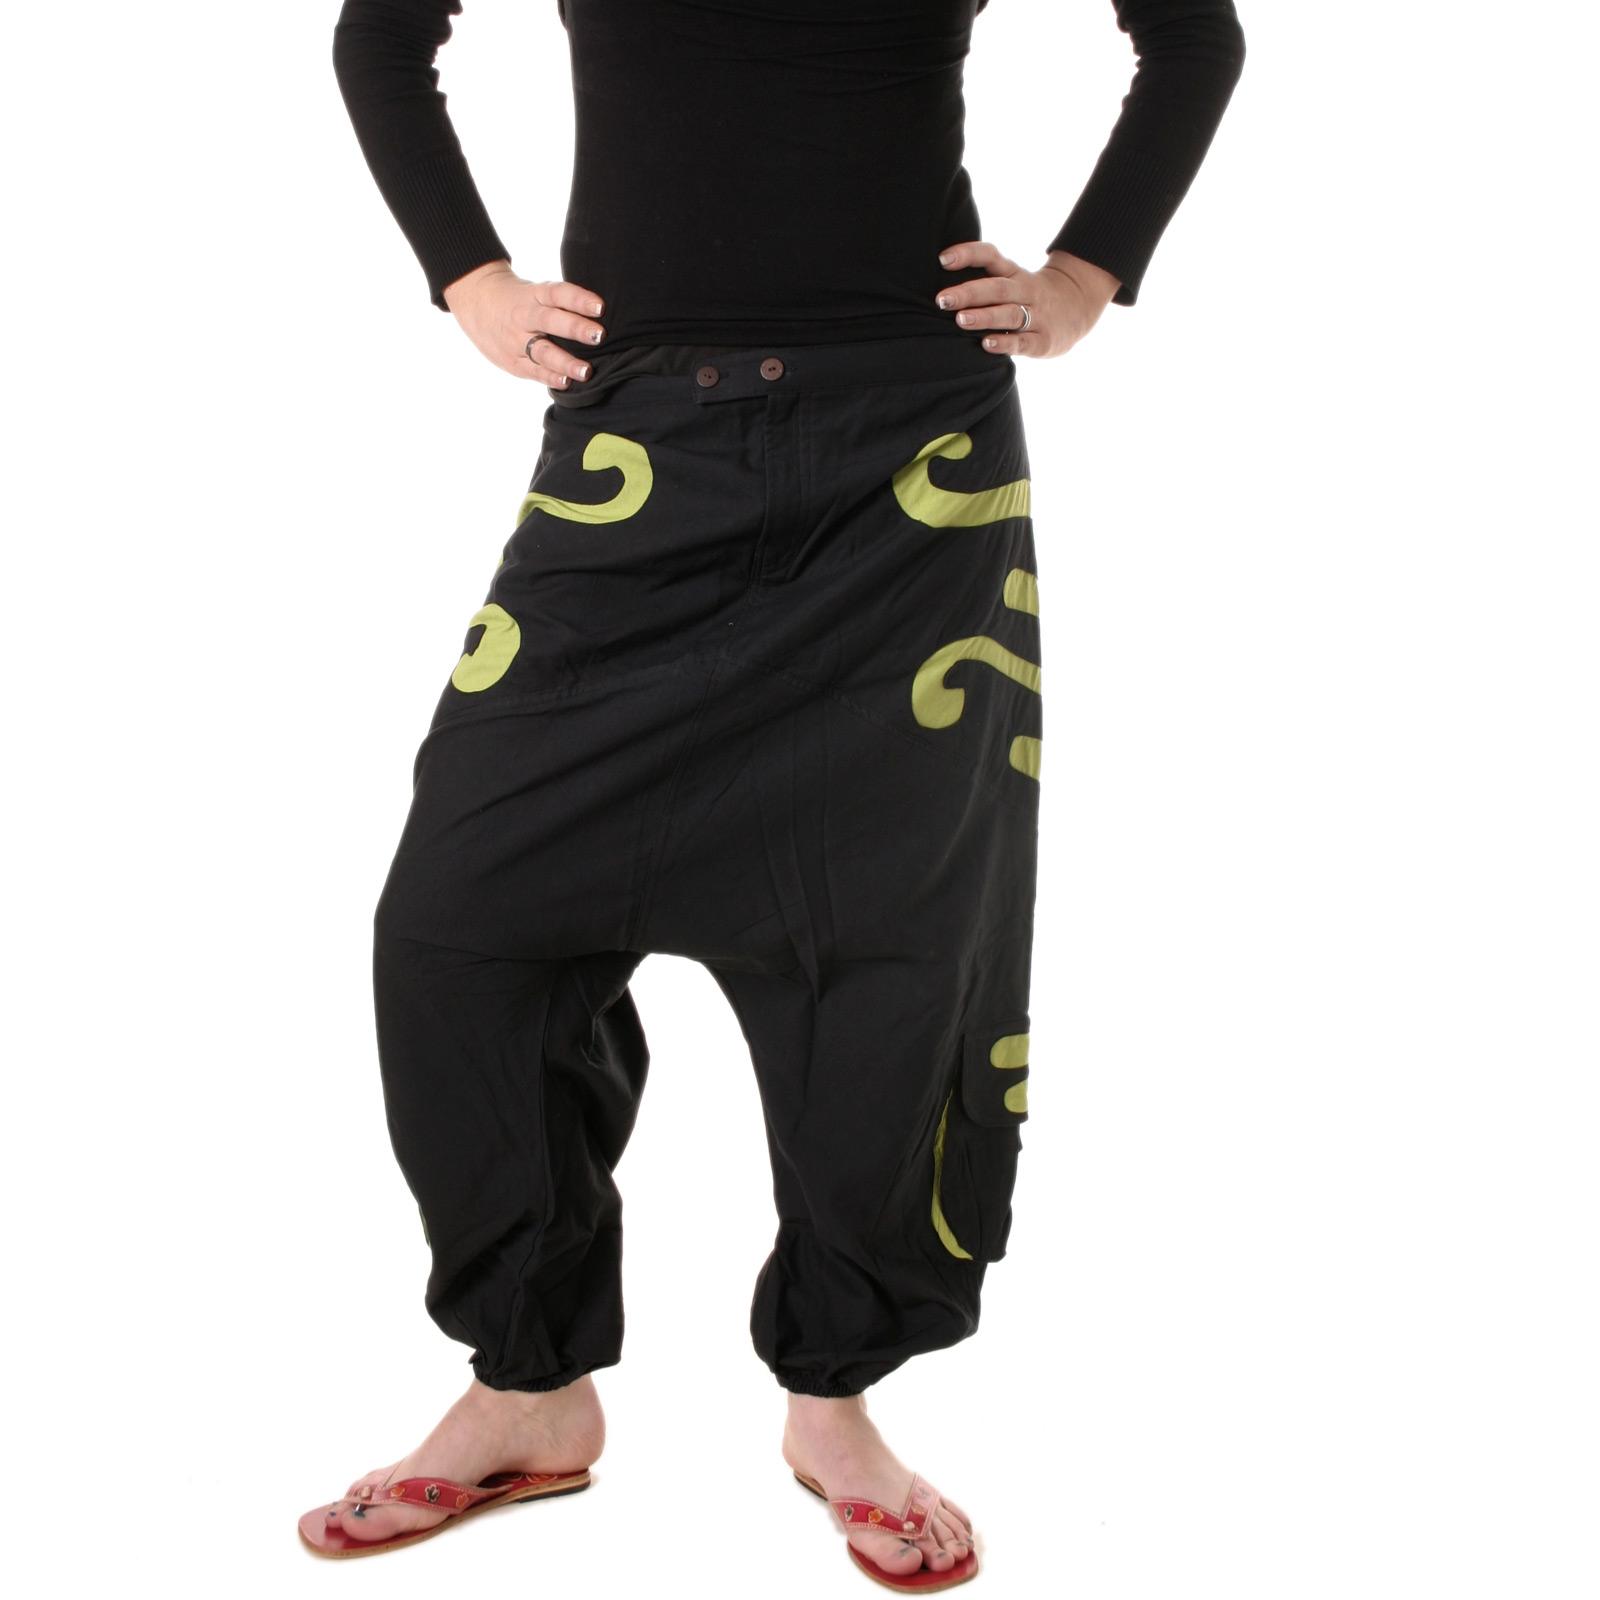 goa hose pumphose aladdinhose nepal ethno haremshose pluderhose damen herrenhose ebay. Black Bedroom Furniture Sets. Home Design Ideas